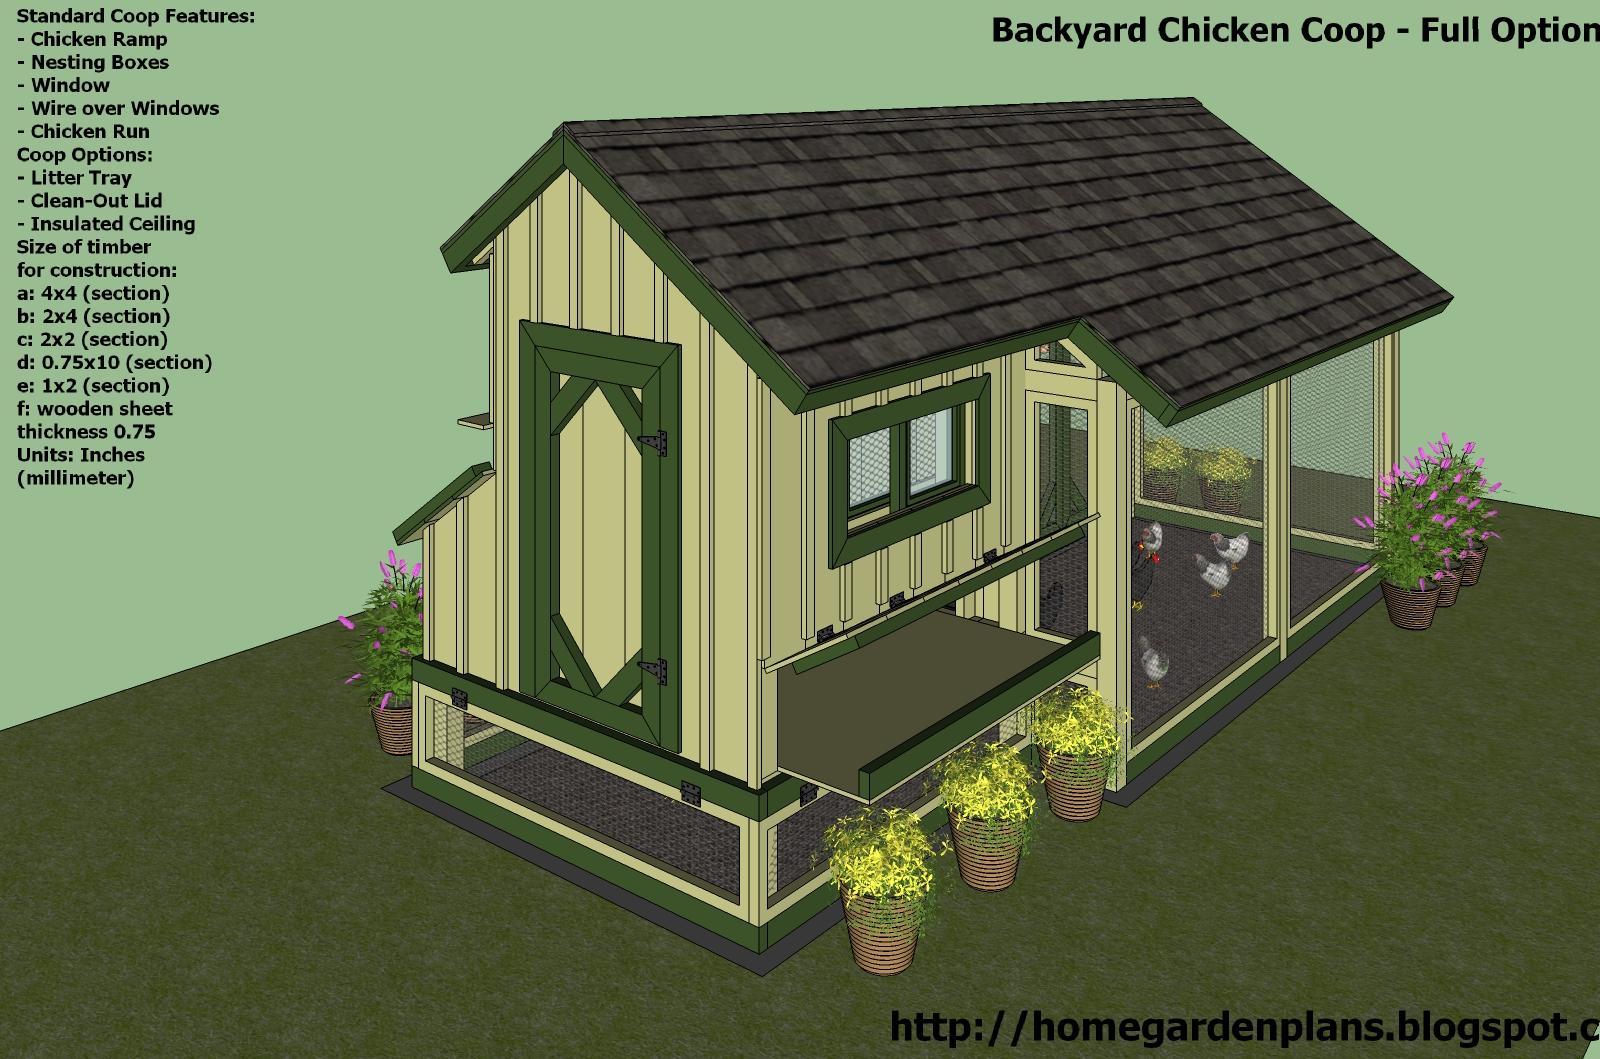 Knowing chicken coop designs au coop plan for Chicken coop for 2 chickens